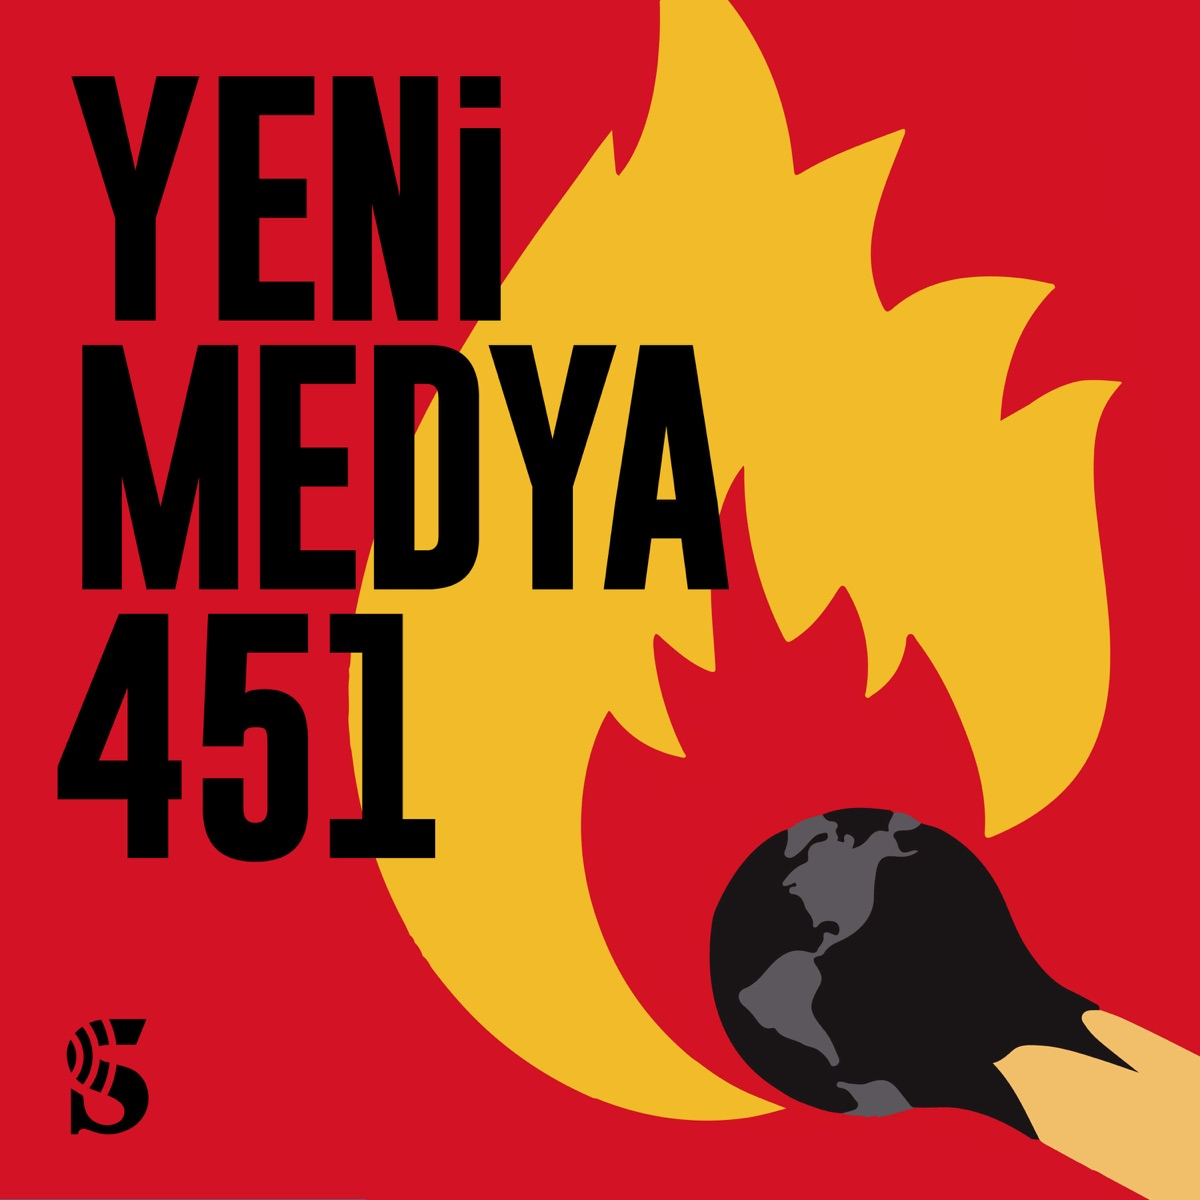 Yeni Medya 451